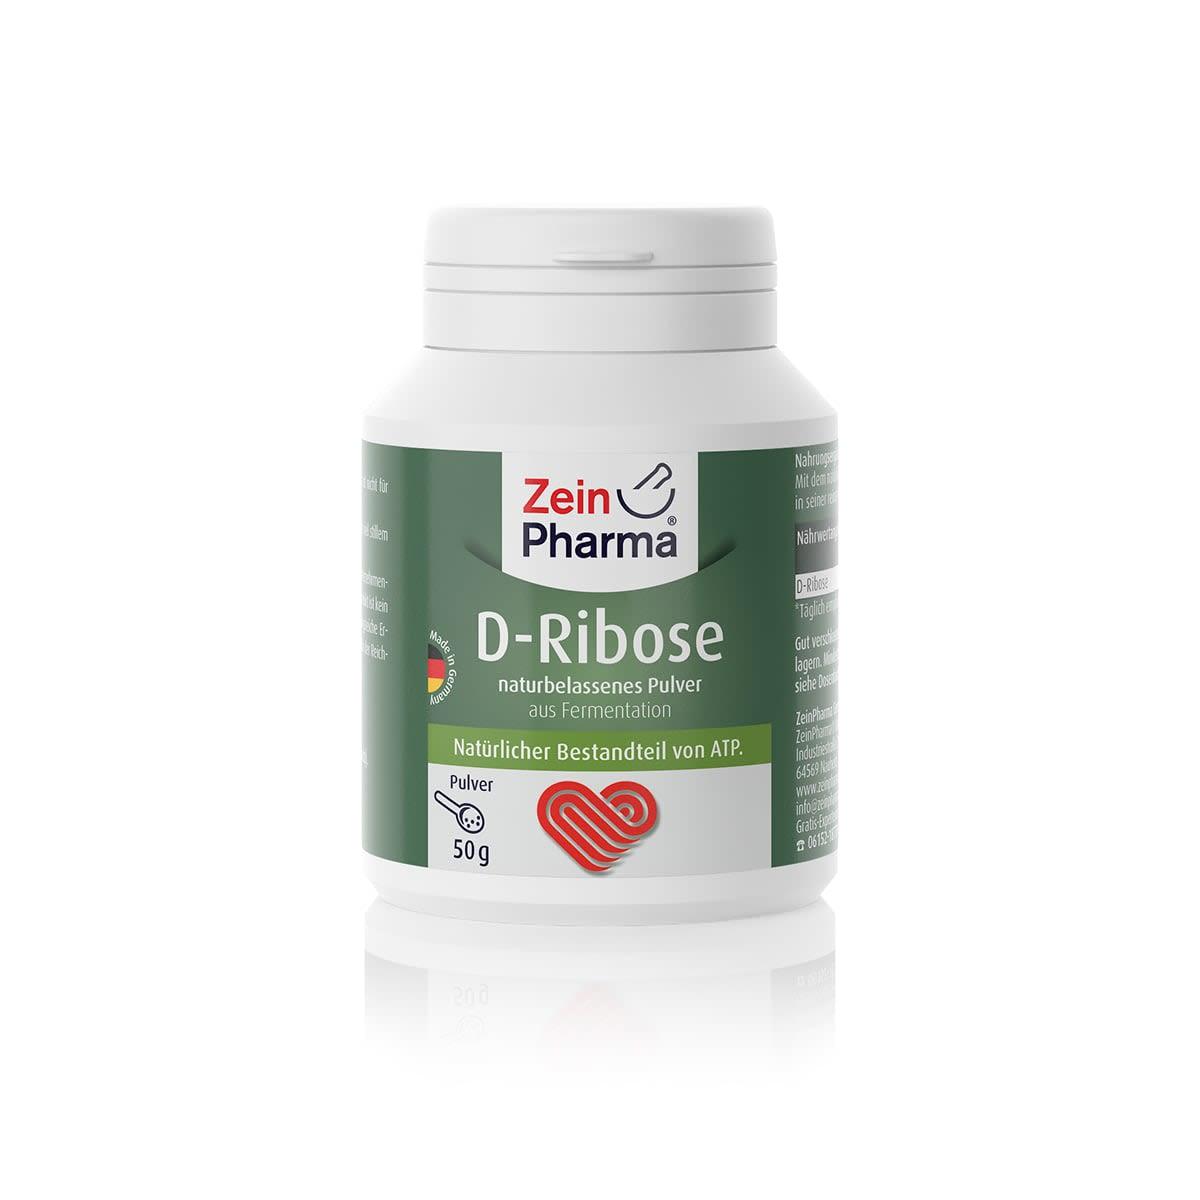 D-Ribose Pulver (200g)